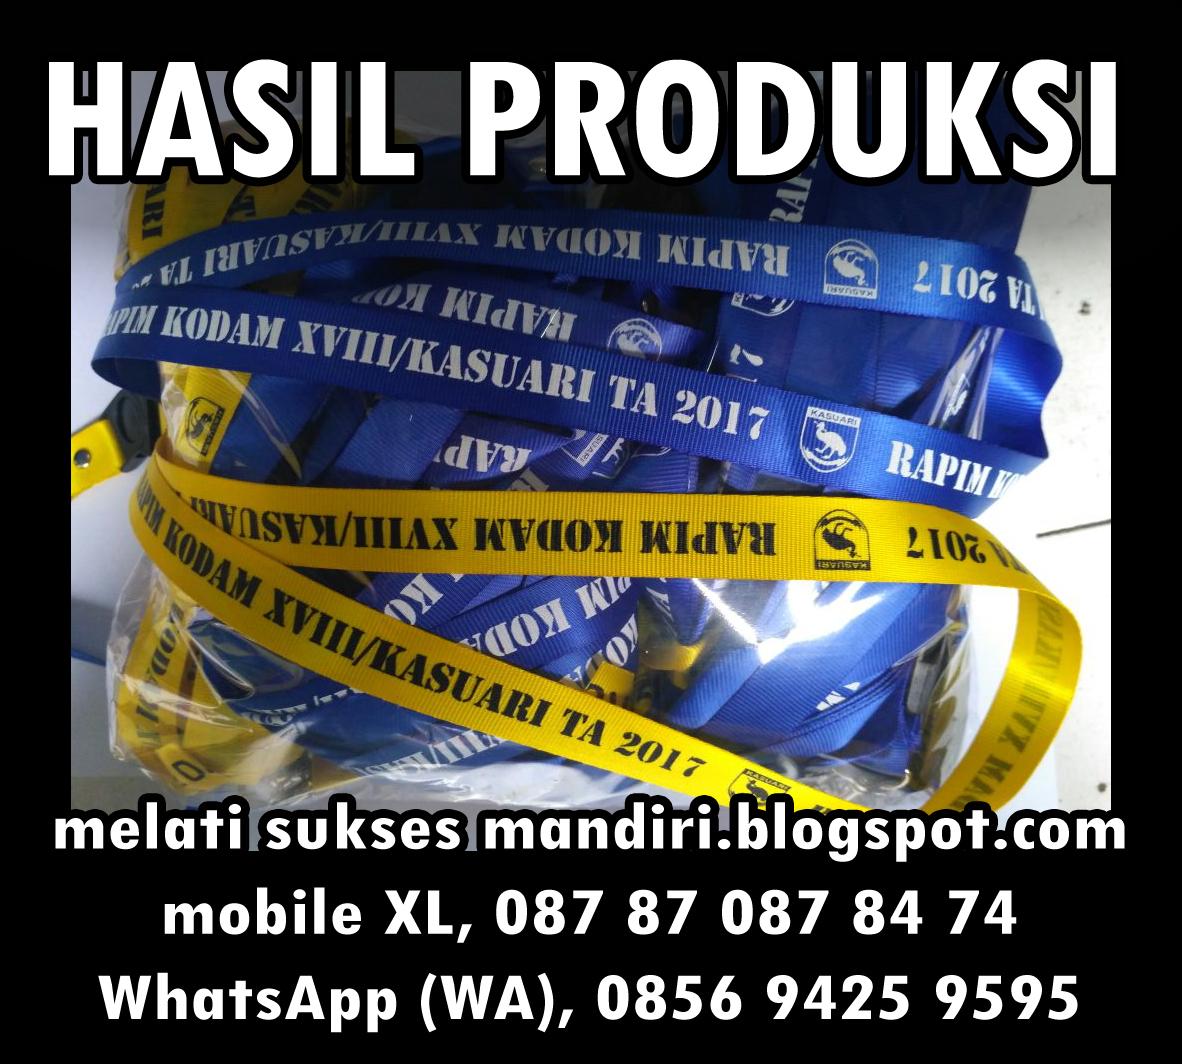 Jasa Desain Paper Bag Malang: Bukit Waringin Design Printing, 087 87 087 84 74: Tomang